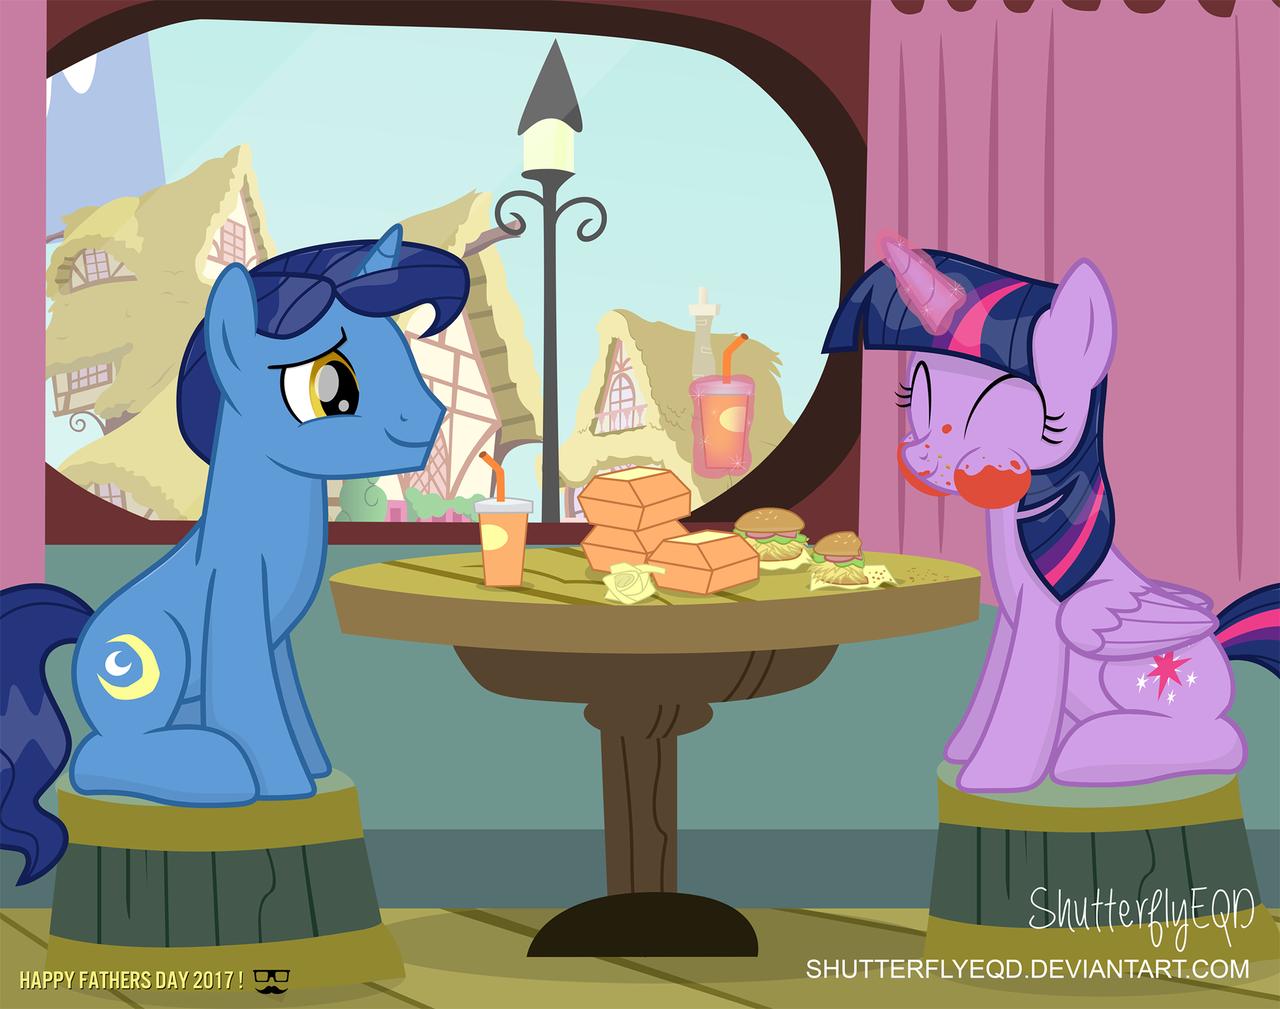 1464498 - alicorn, artist:shutterflyeqd, burger, cute